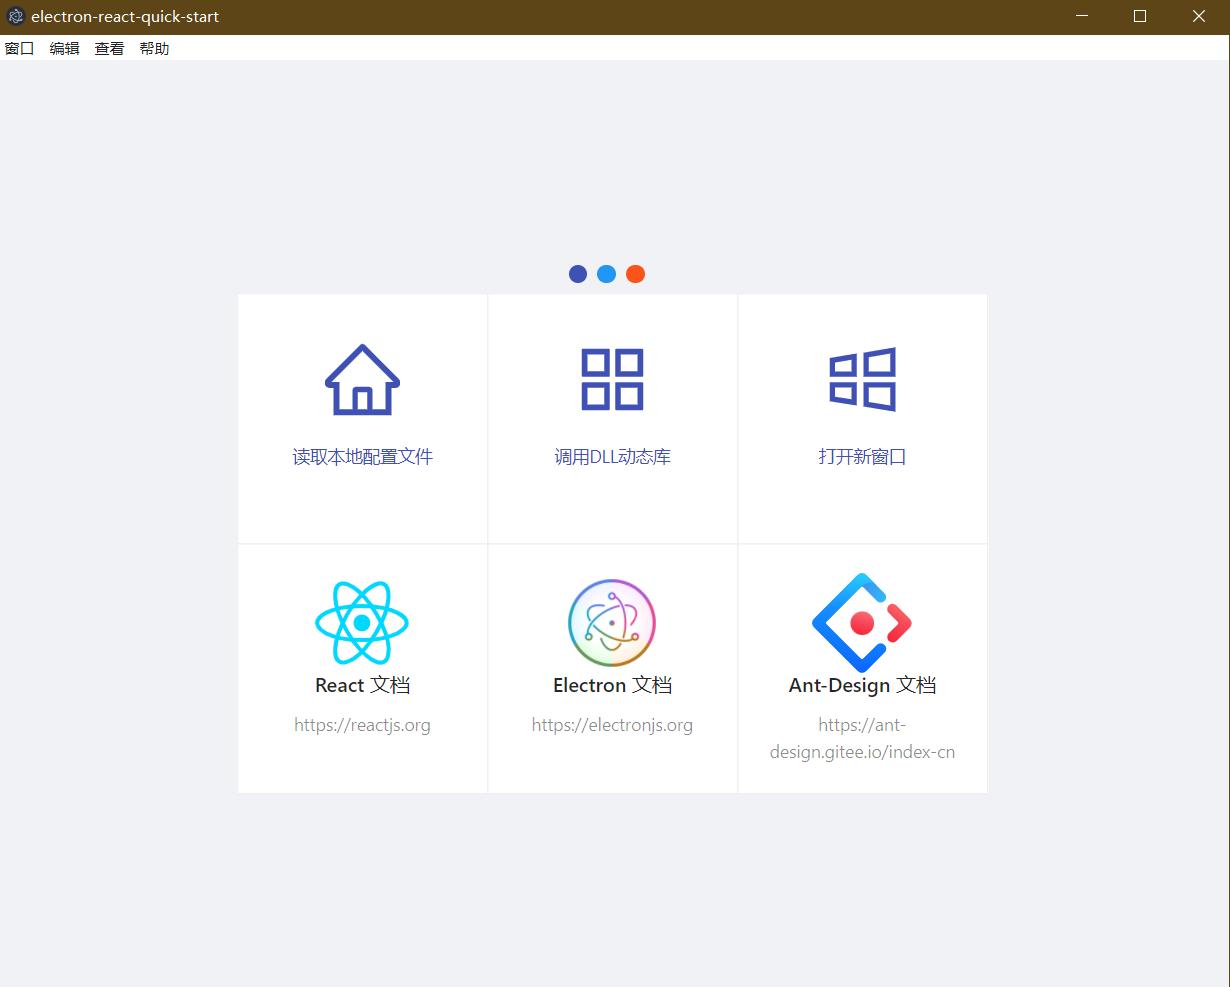 GitHub - fddi/electron-react-quick-start: A template that uses